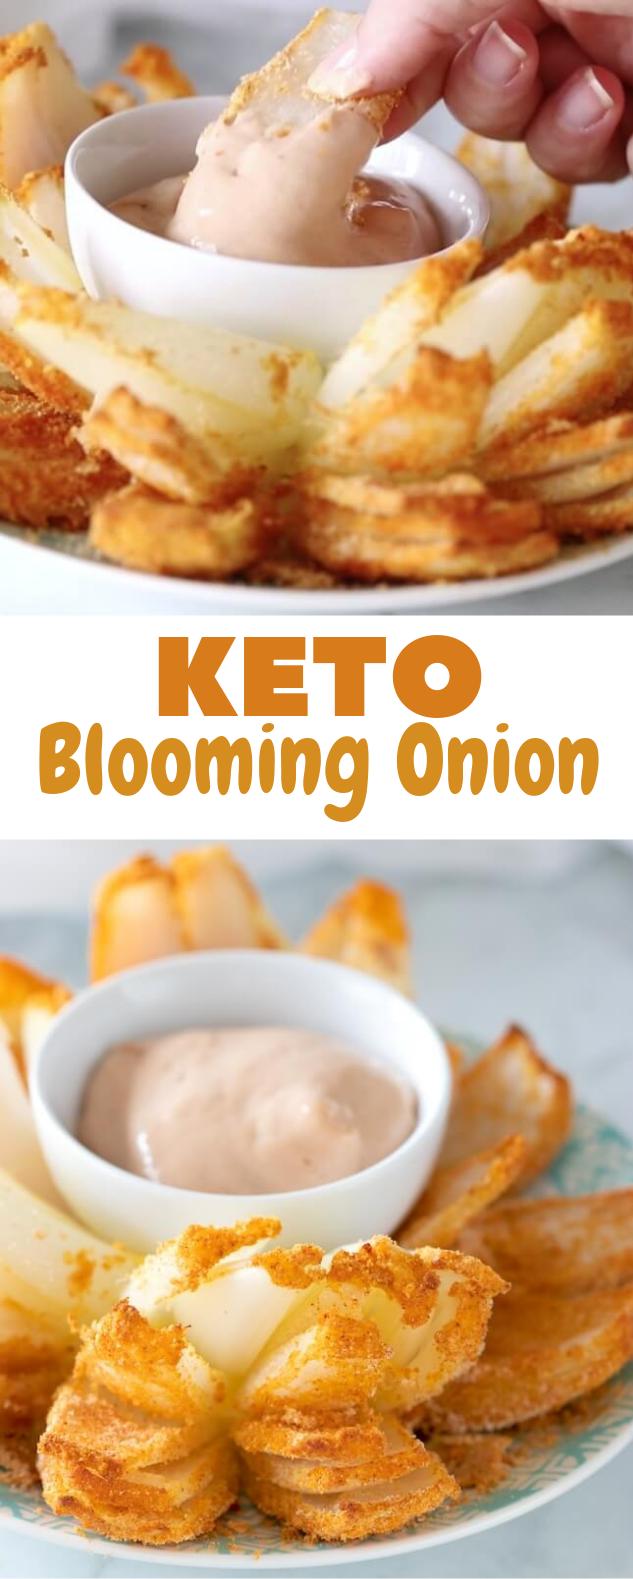 Keto outback menu